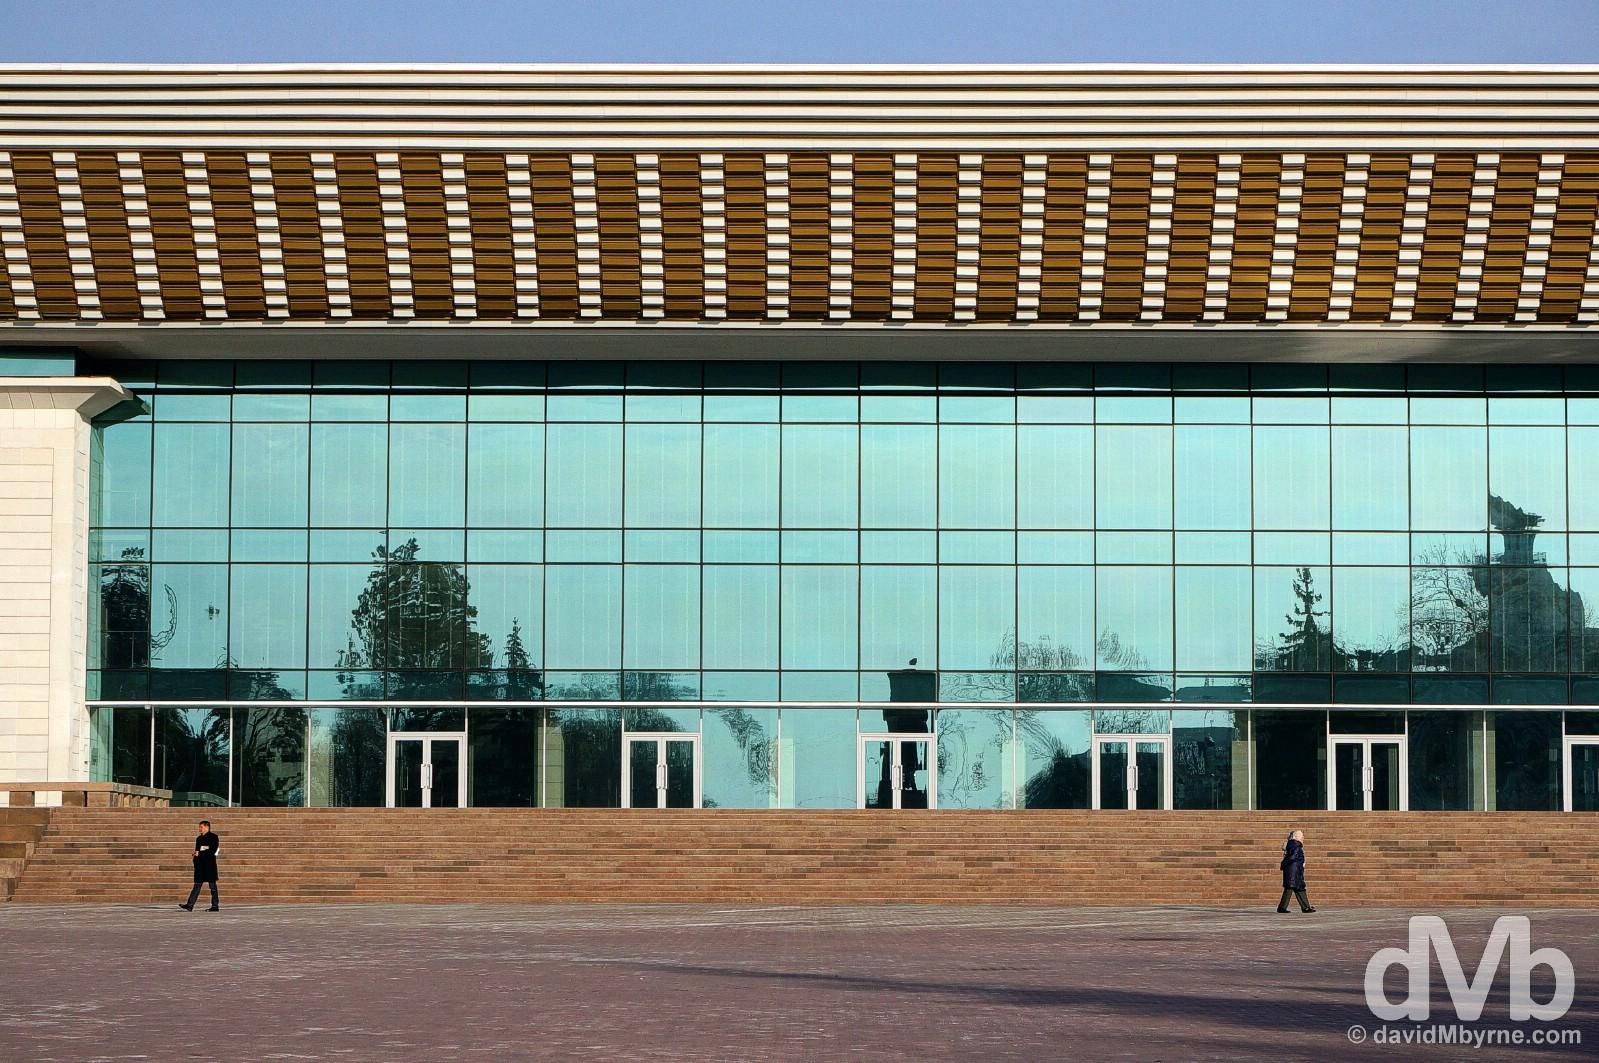 Palace of the Republic, Almaty, Kazakhstan. February 21, 2015.